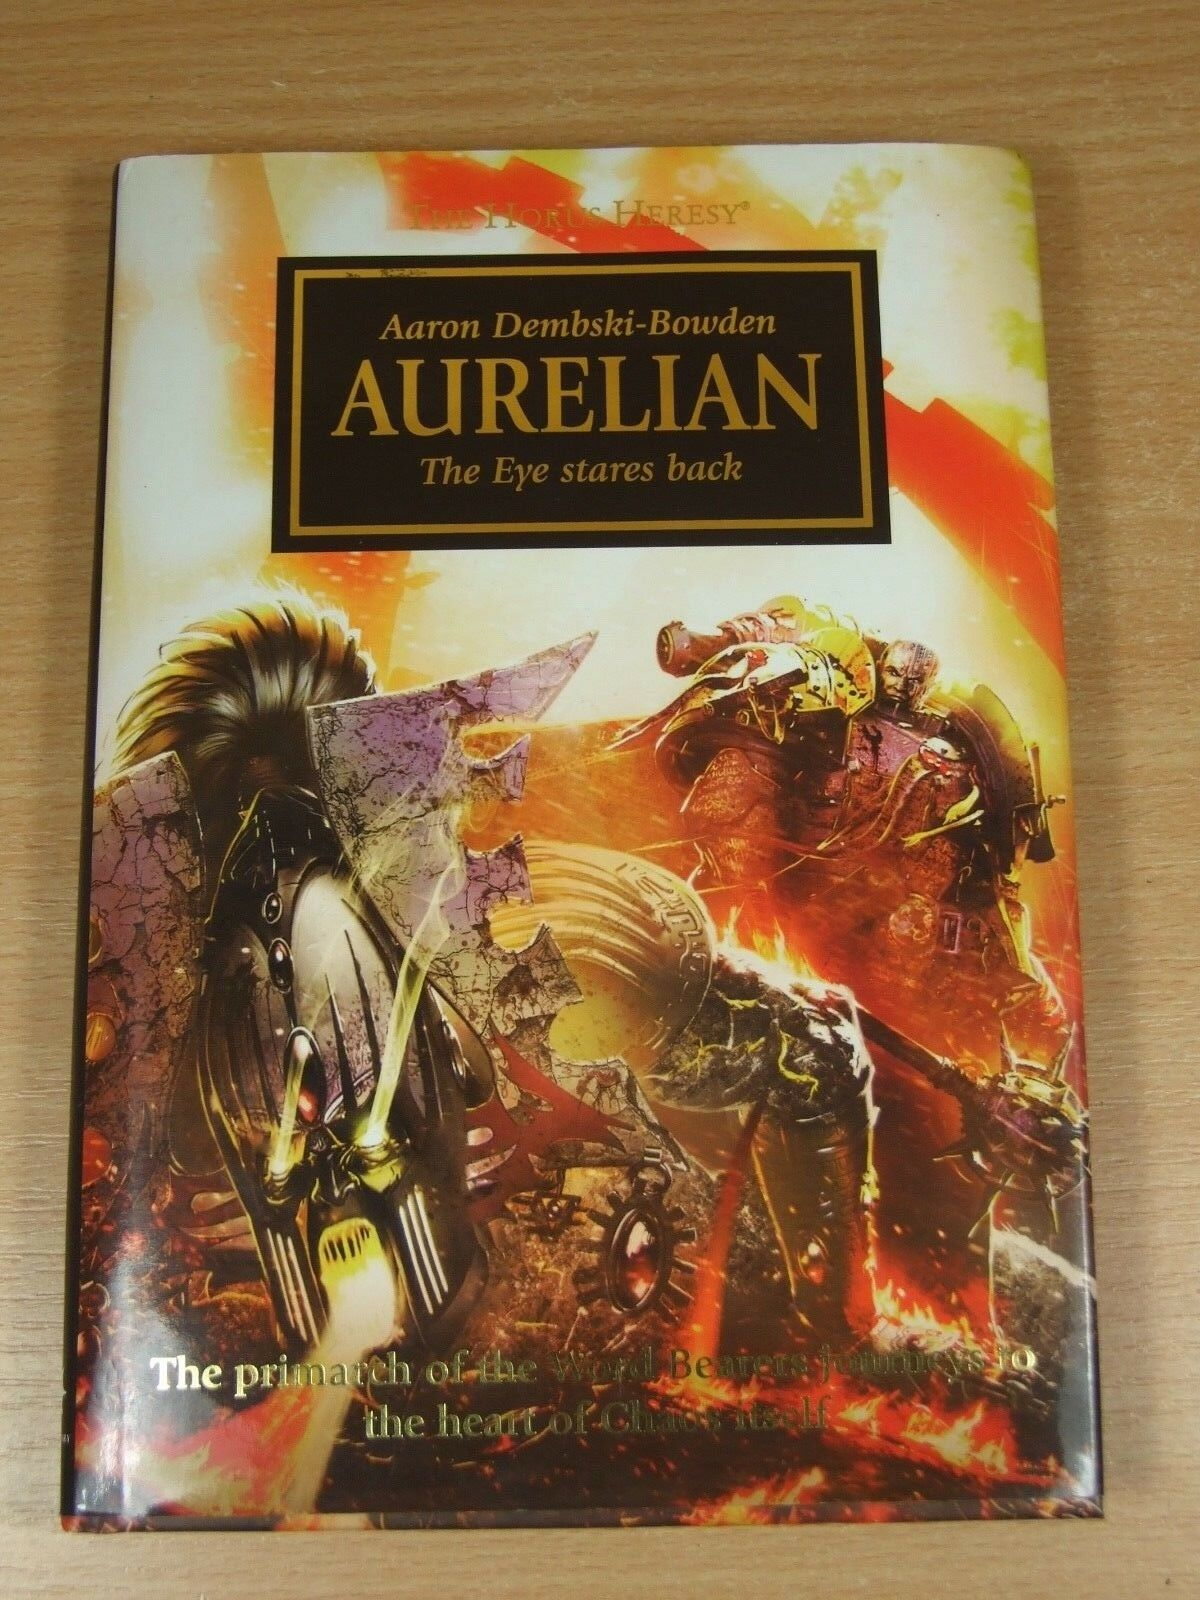 Libro de tapa dura Warhammer el Horus Heresy Aureliano aaron dembski-bowden oro